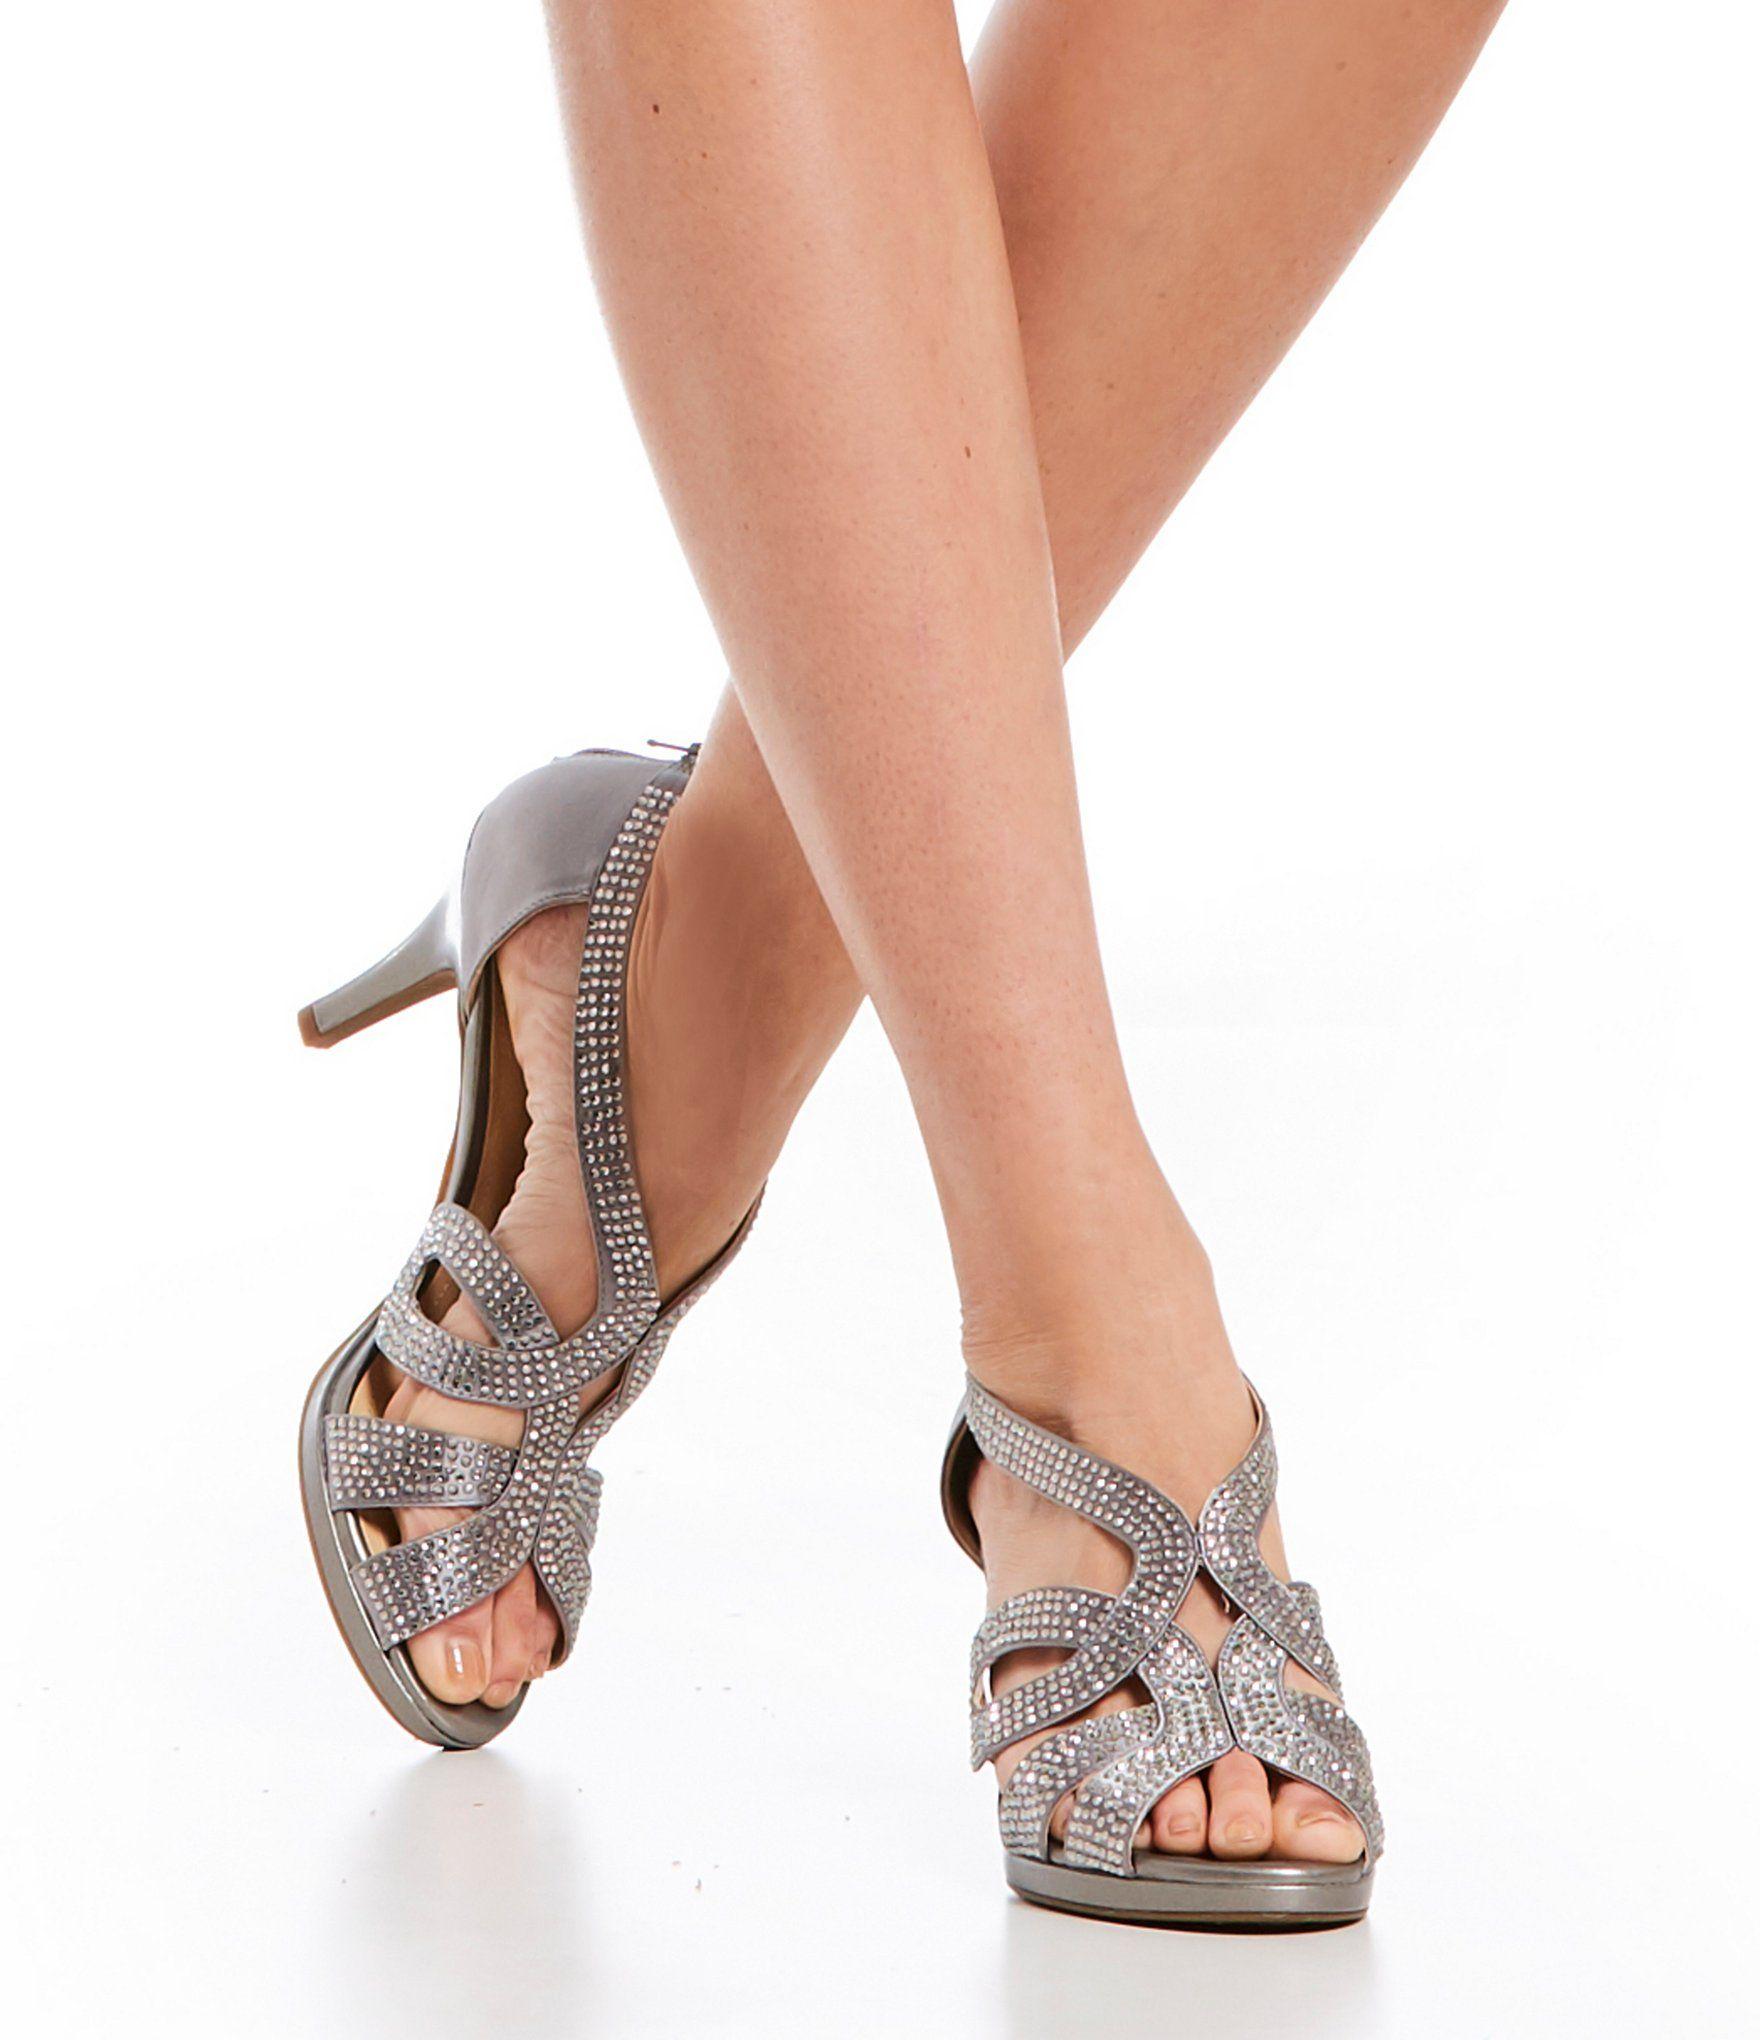 Dayten Rhinestone-Embellished Satin Dress Sandals uFAsZOT